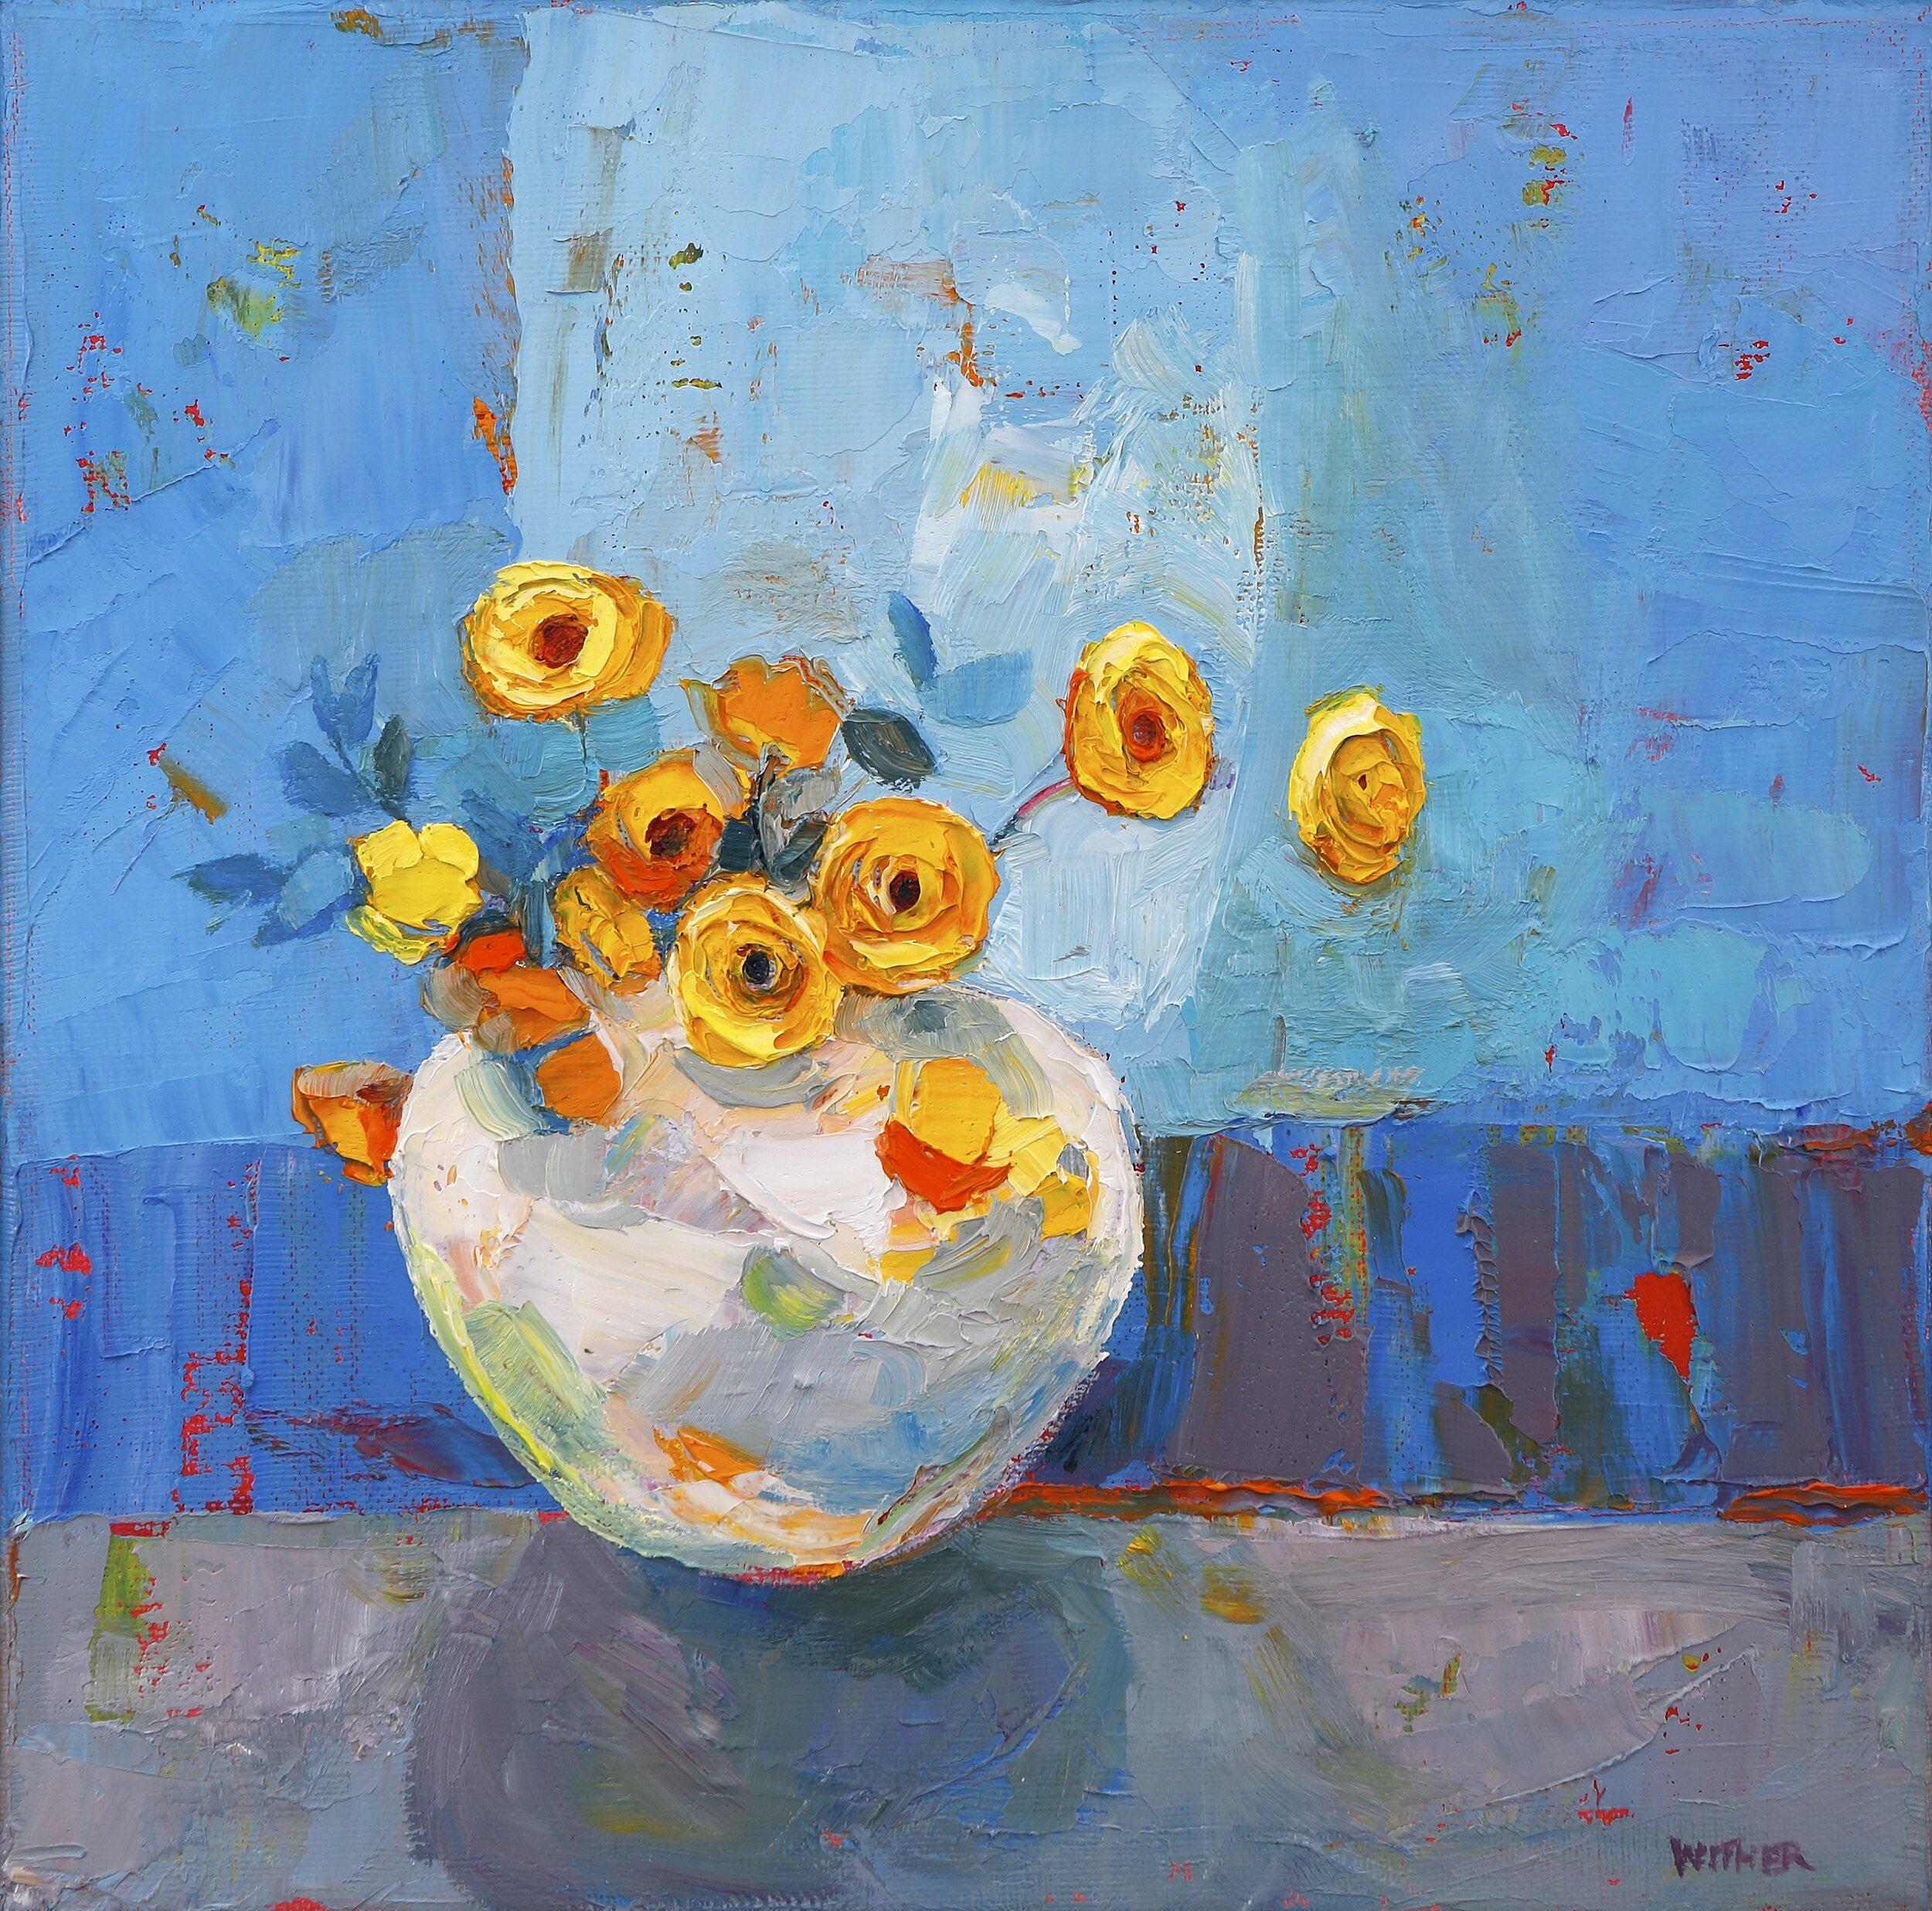 Title: A Dozen Yellow Gems  Size: 10x10in  Medium: Oil on Canvas  Price: £1500